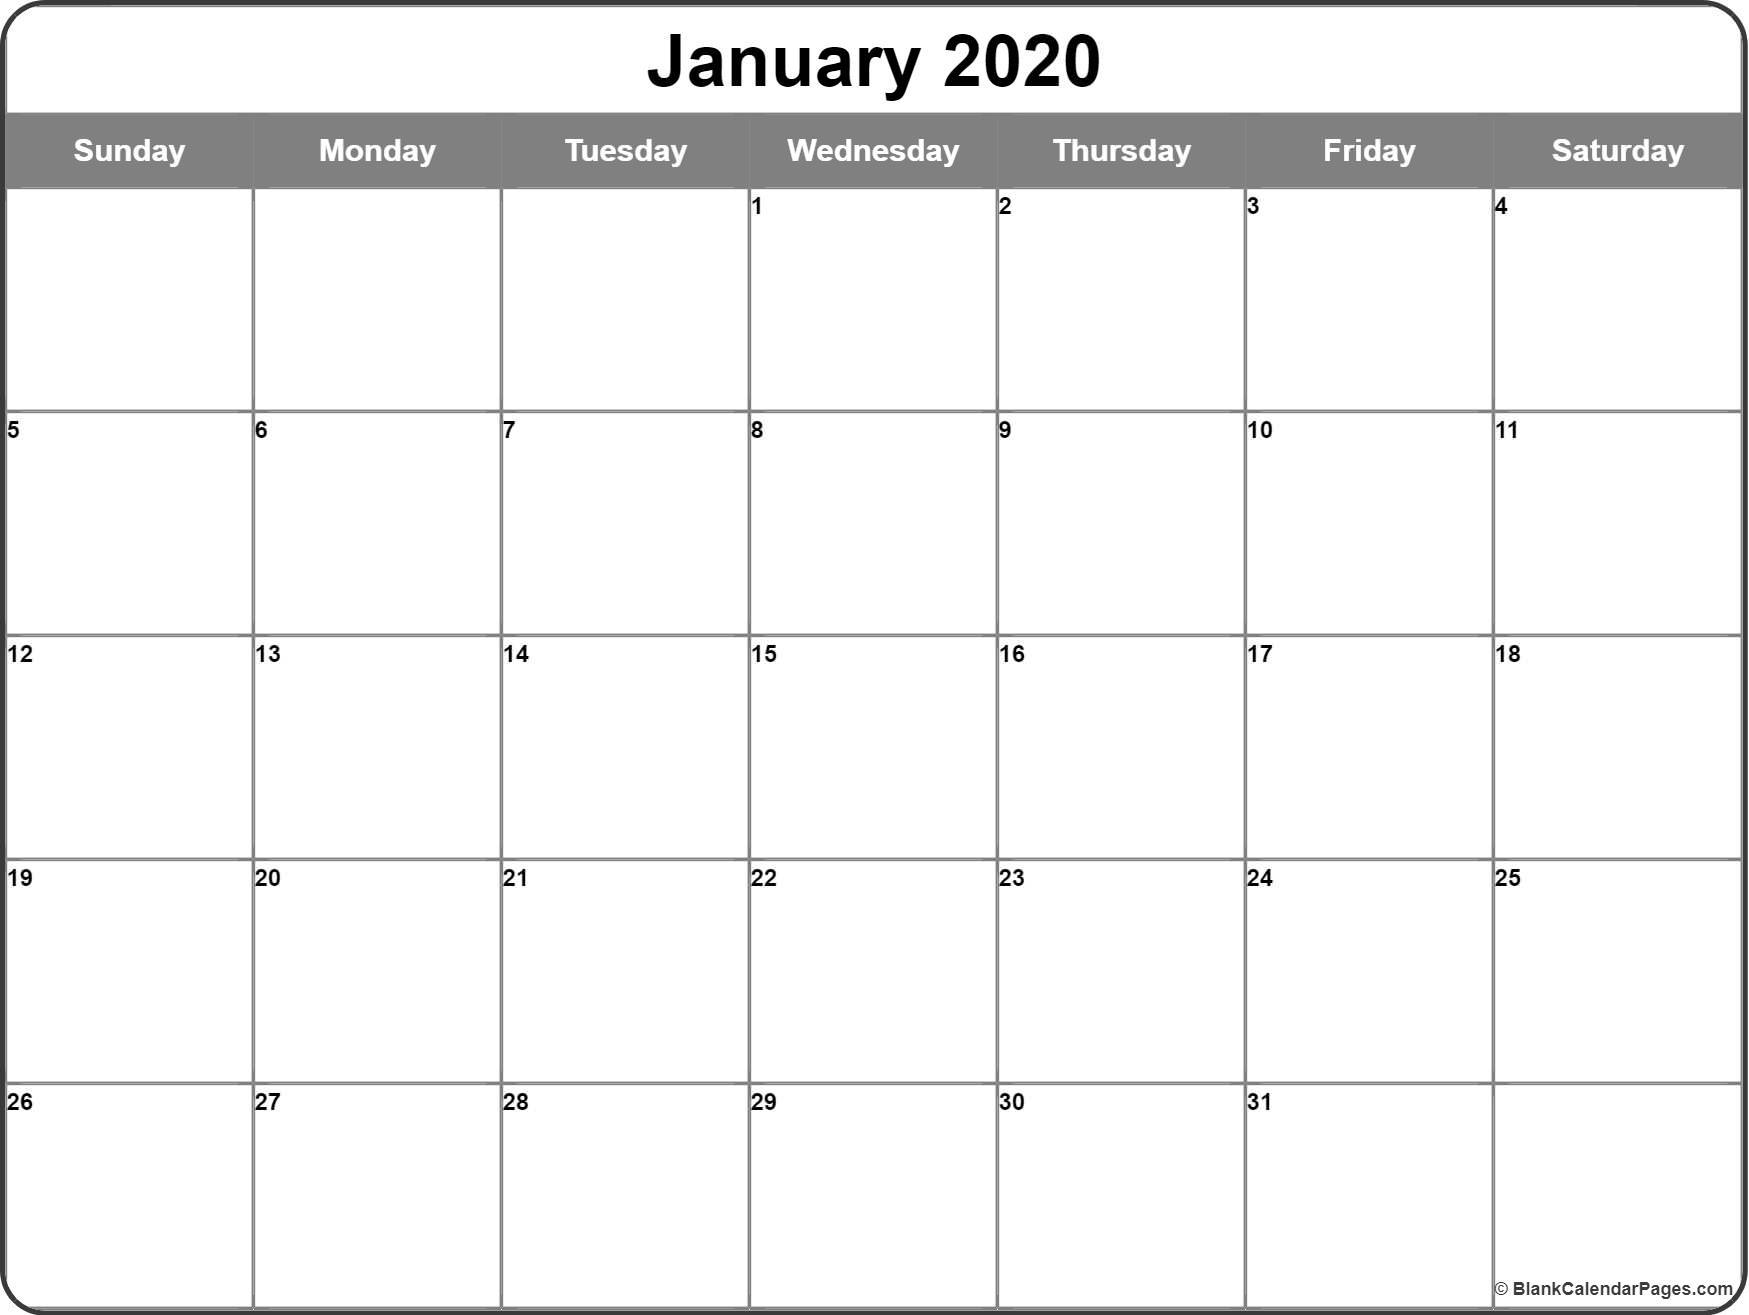 January 2020 Calendar   Free Printable Monthly Calendars regarding Print Free Calendars Without Downloading 2020